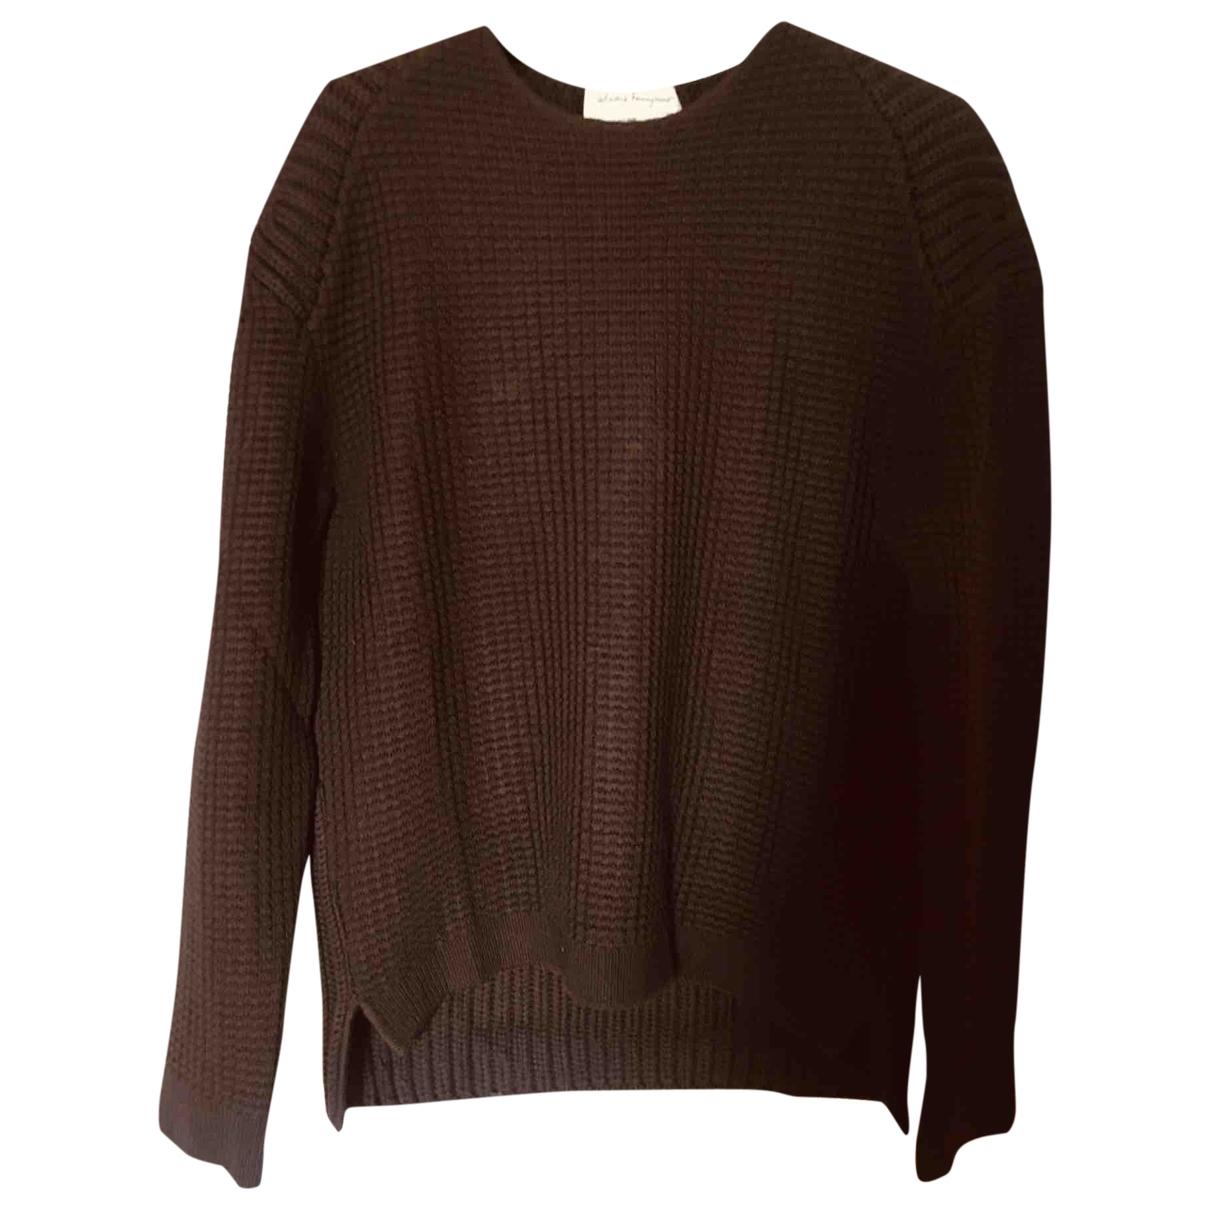 Salvatore Ferragamo \N Brown Wool Knitwear & Sweatshirts for Men M International